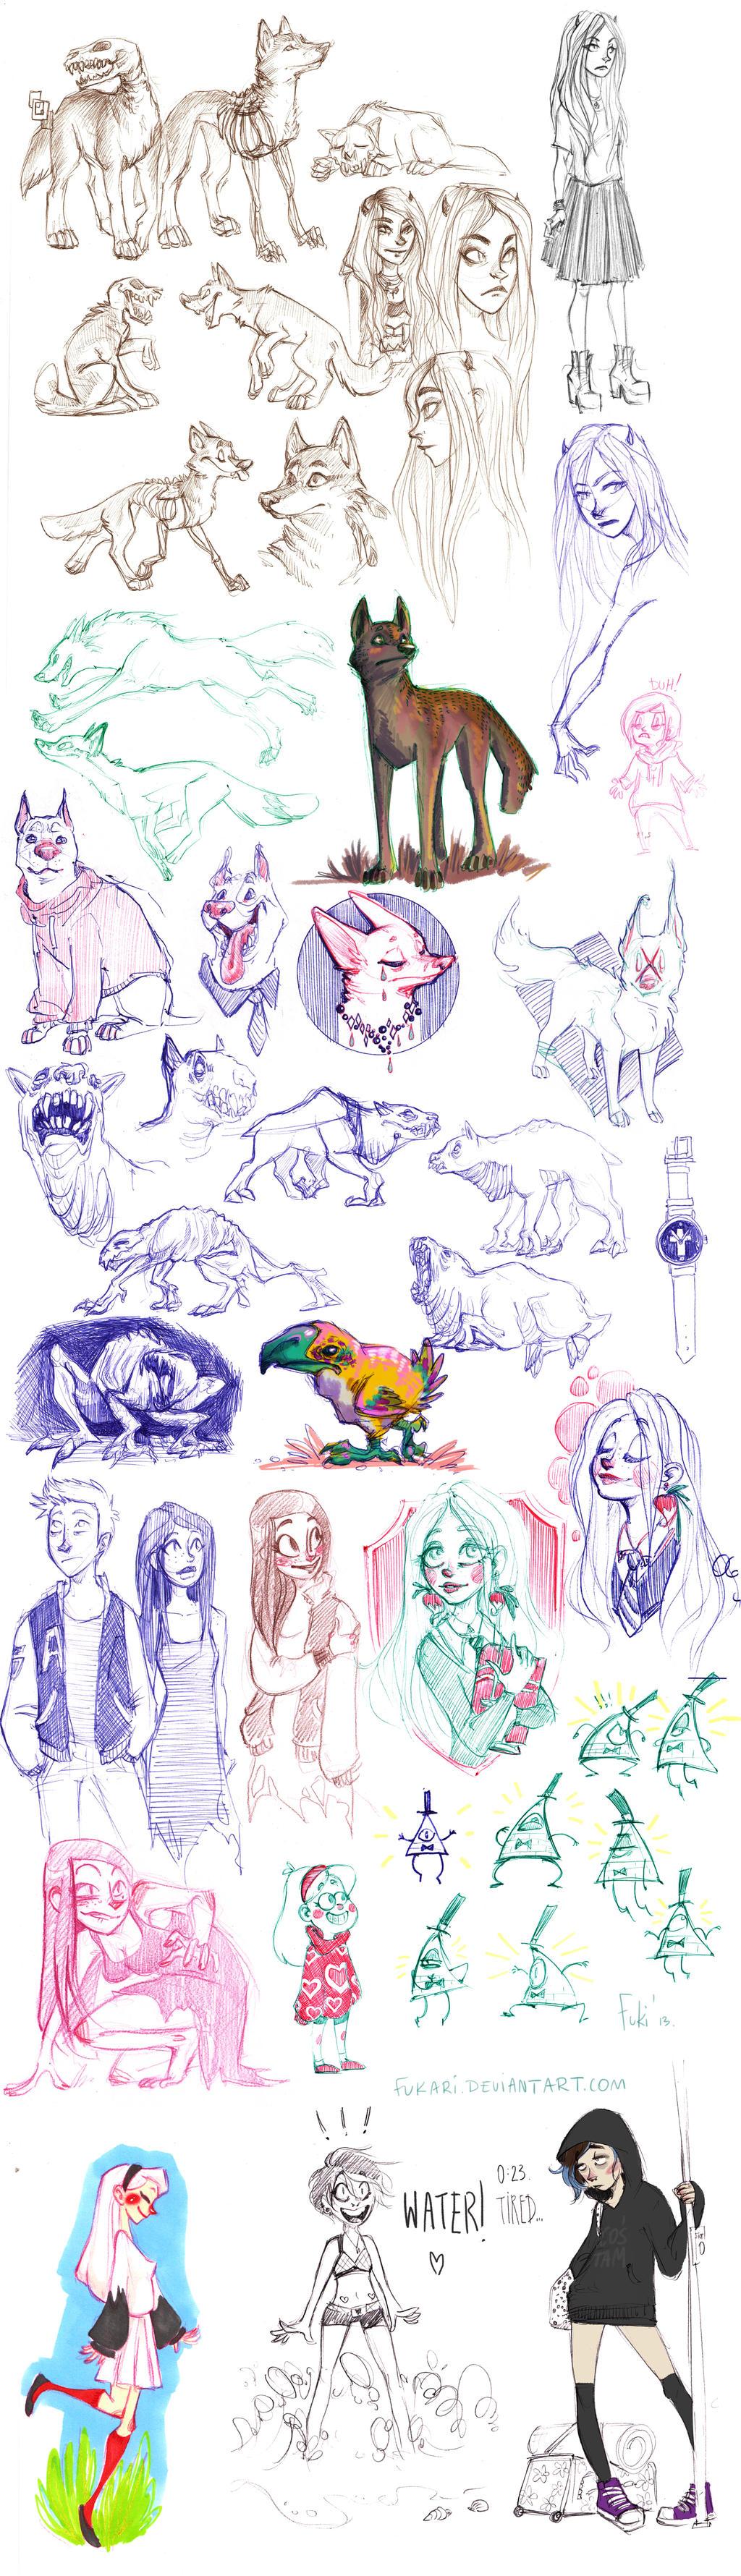 sketch dump from job by Fukari